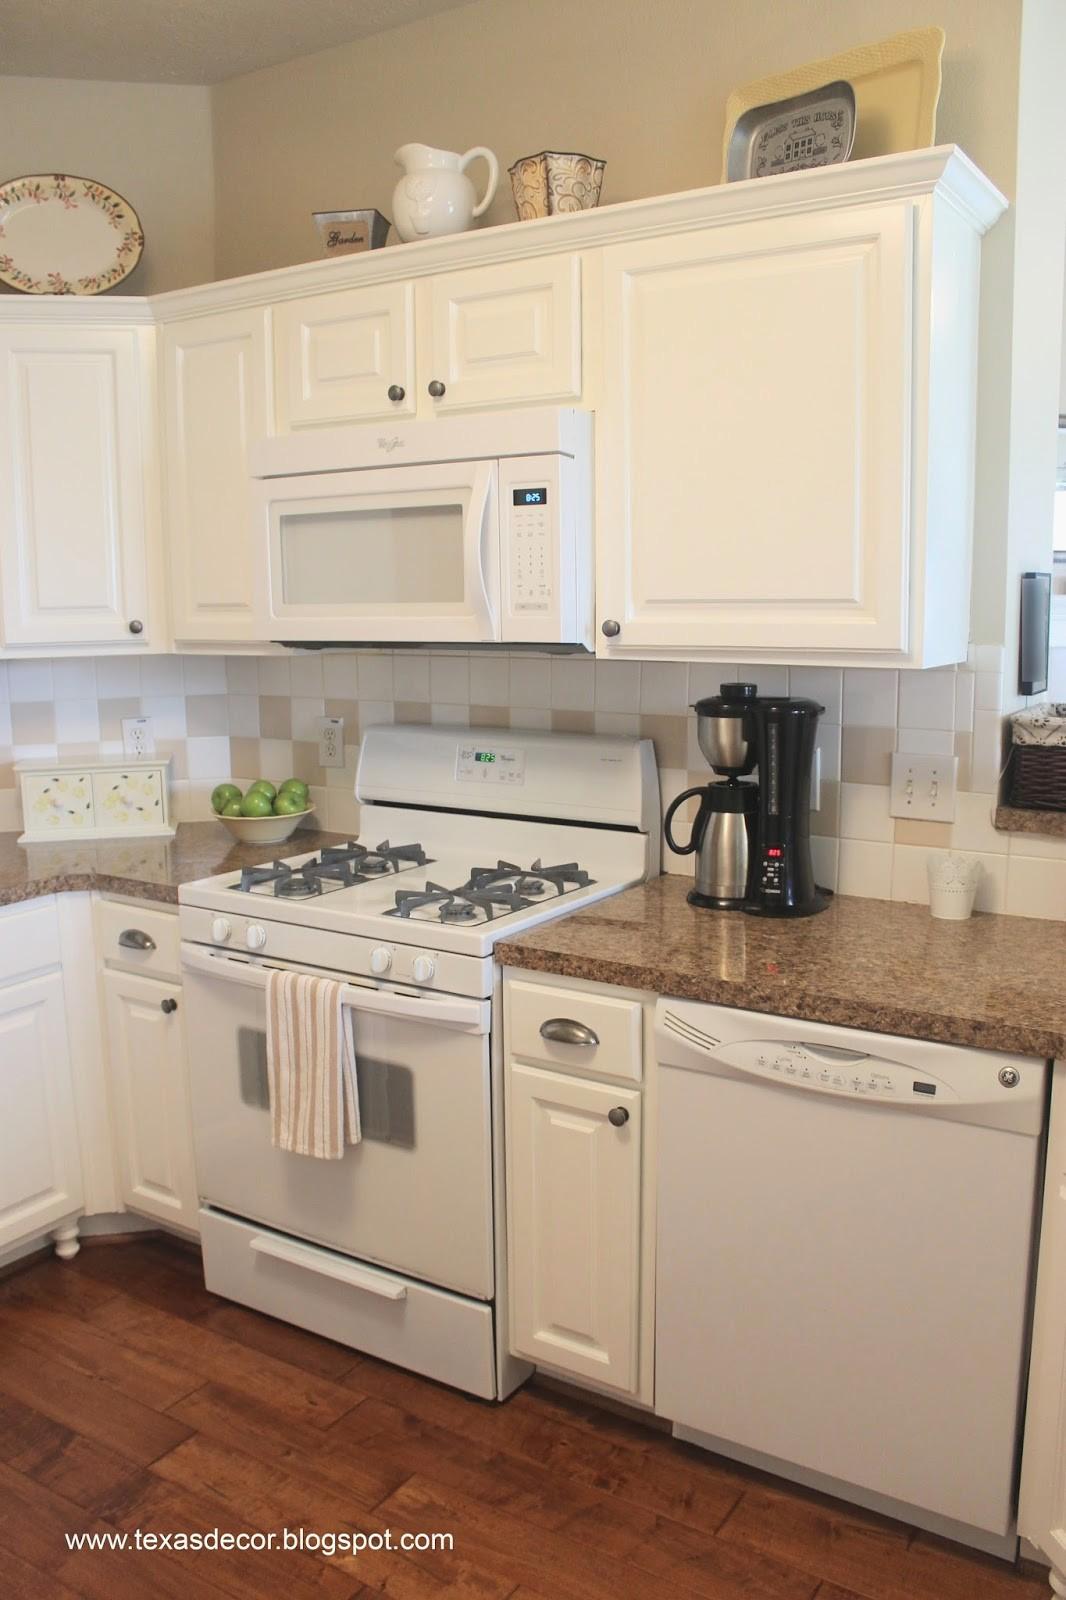 white kitchen cabinets with white appliances off white kitchen cabinet paint colors best of painted kitchen HMKVPHP